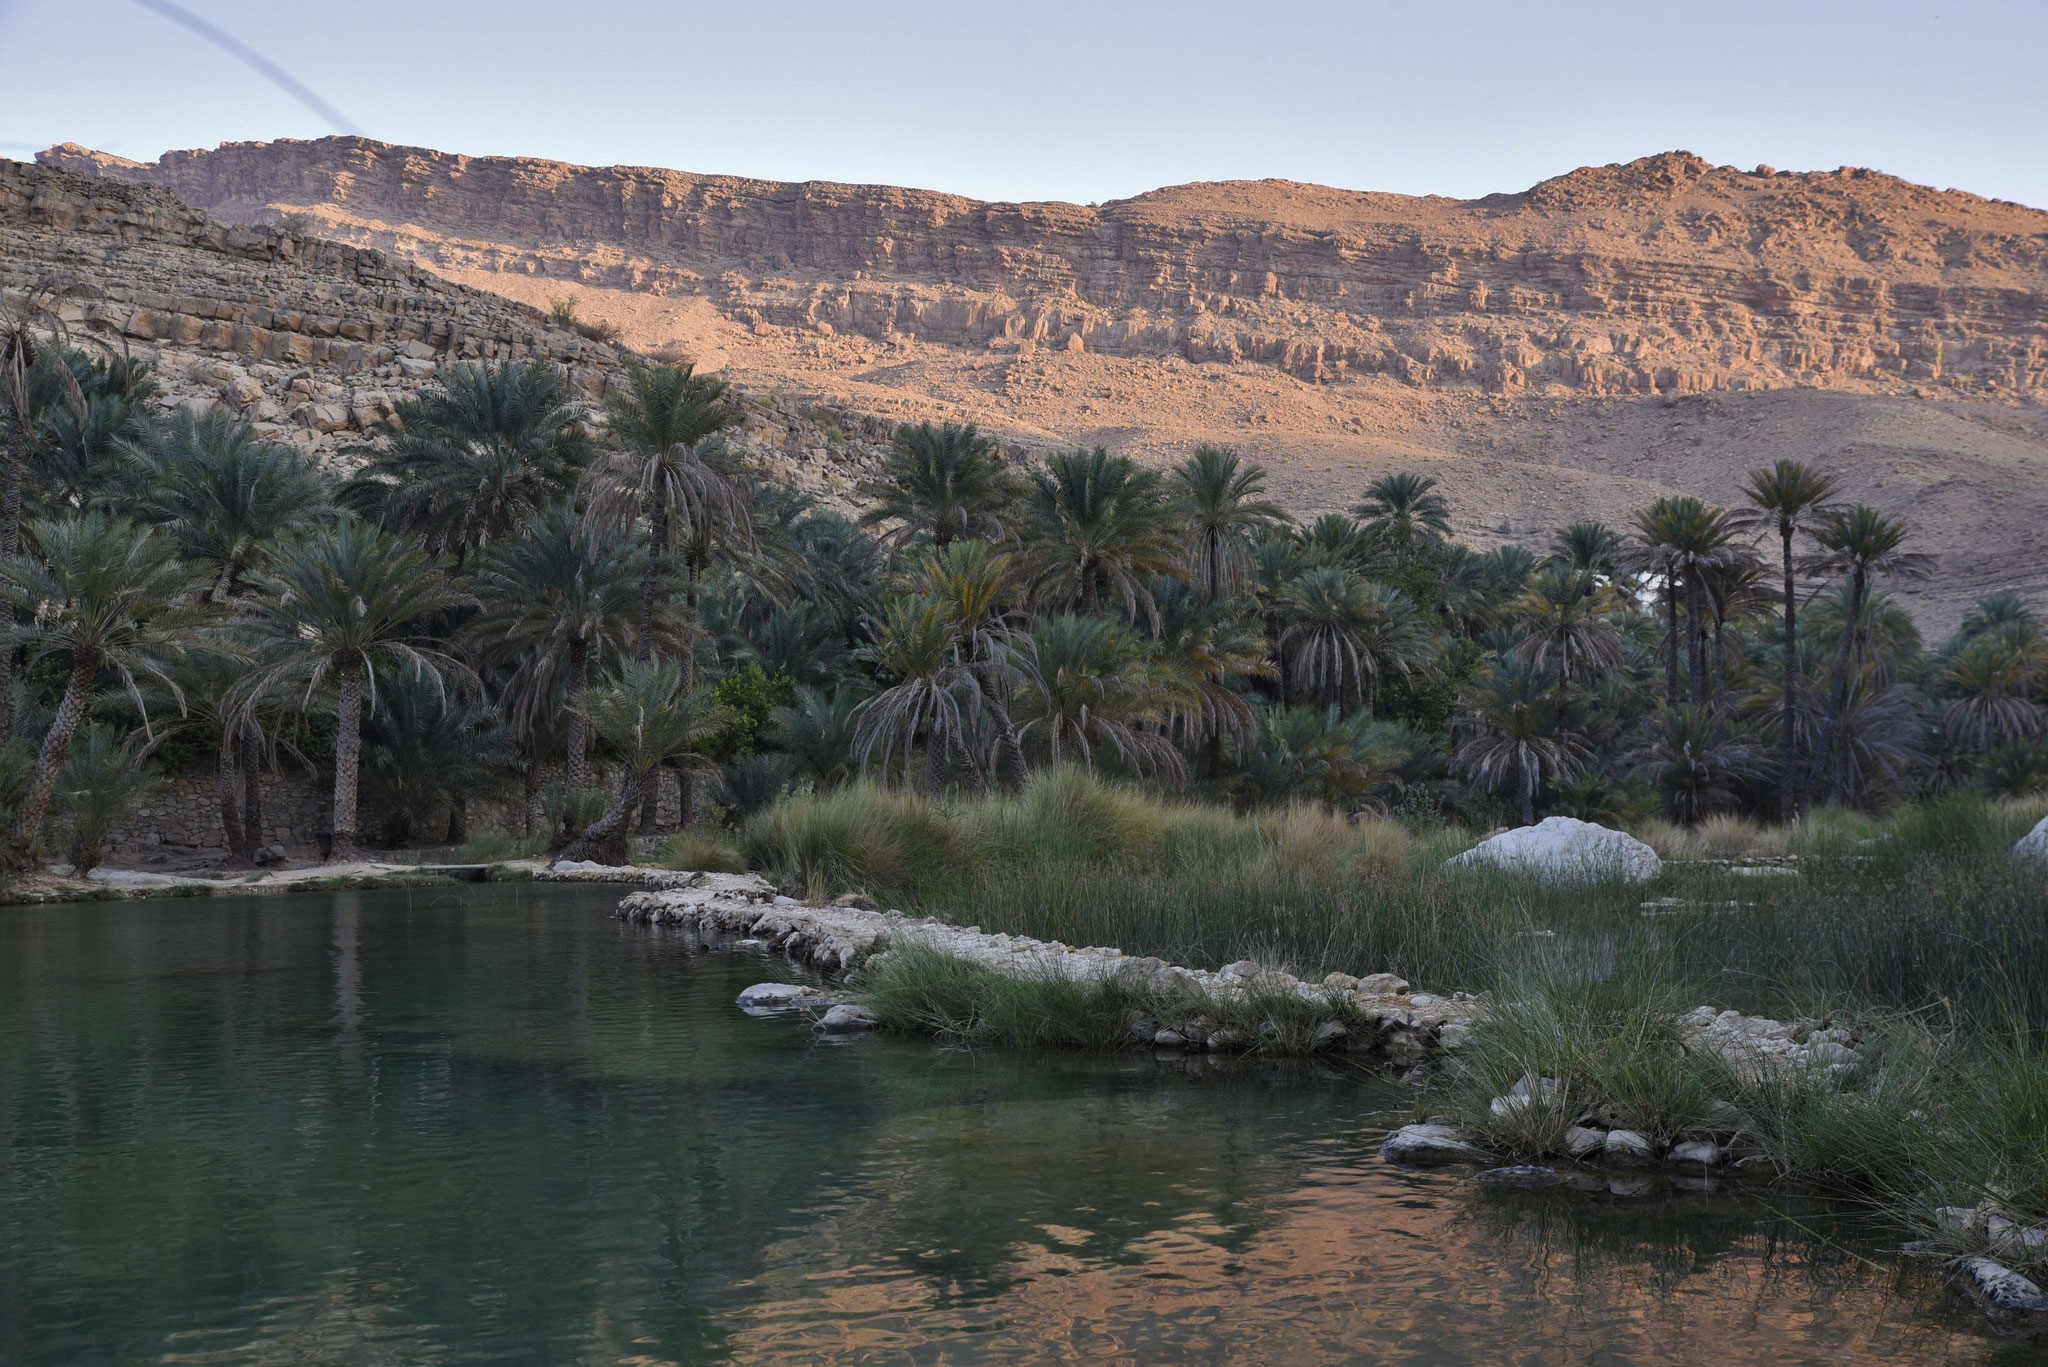 """Pool-Bereich"" des Wadi Bani Khalid II"